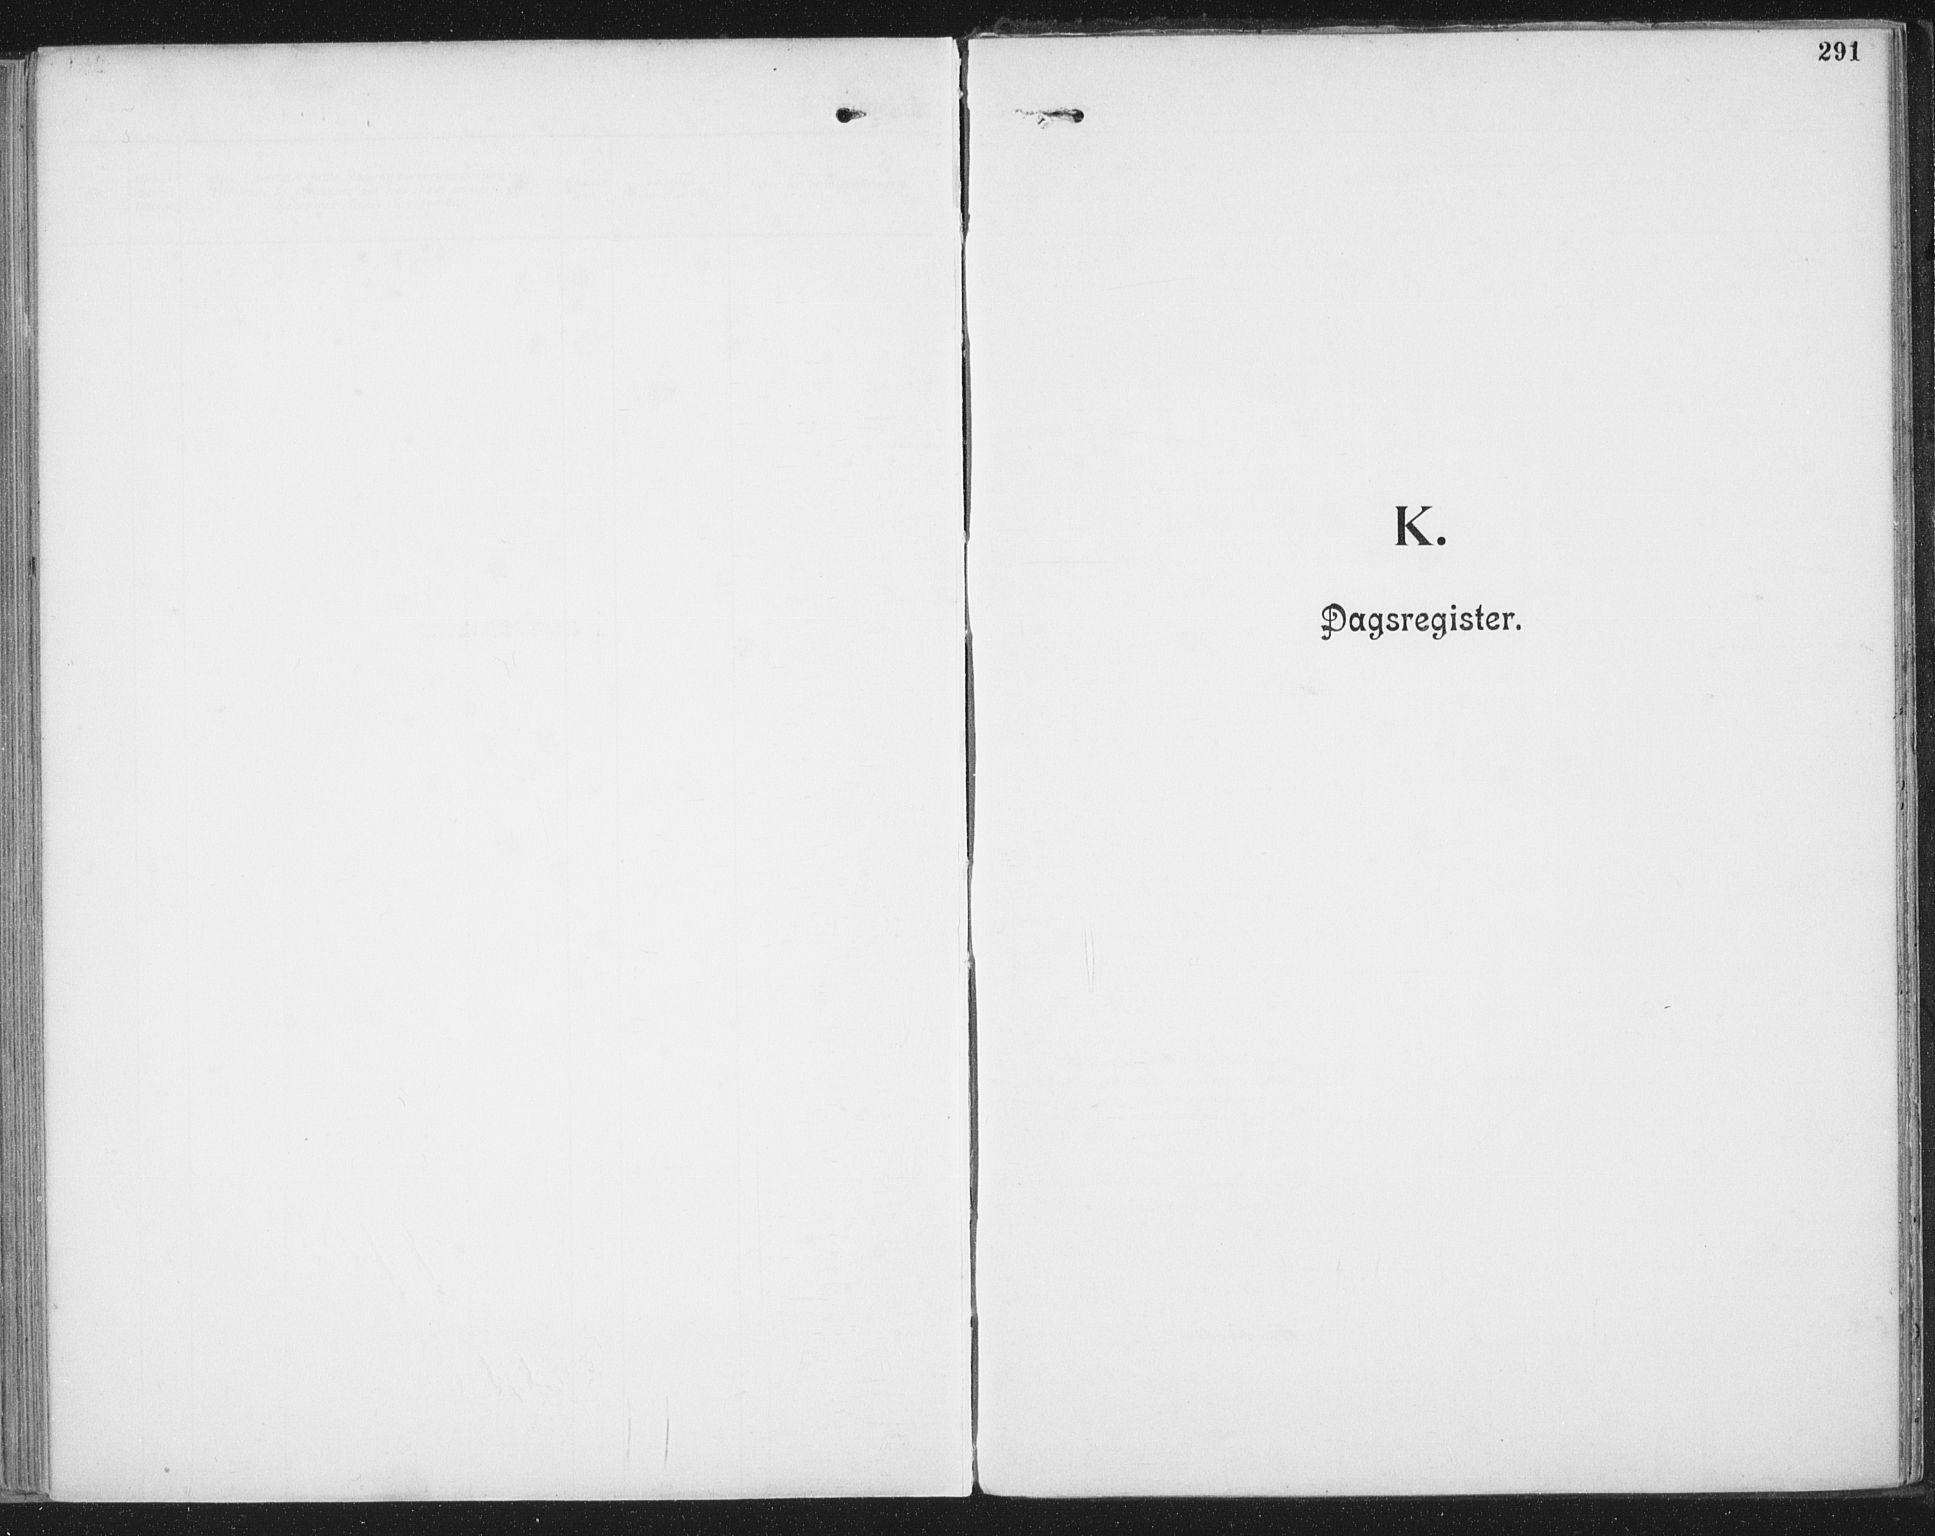 SAT, Ministerialprotokoller, klokkerbøker og fødselsregistre - Nordland, 804/L0081: Ministerialbok nr. 804A02, 1901-1915, s. 291